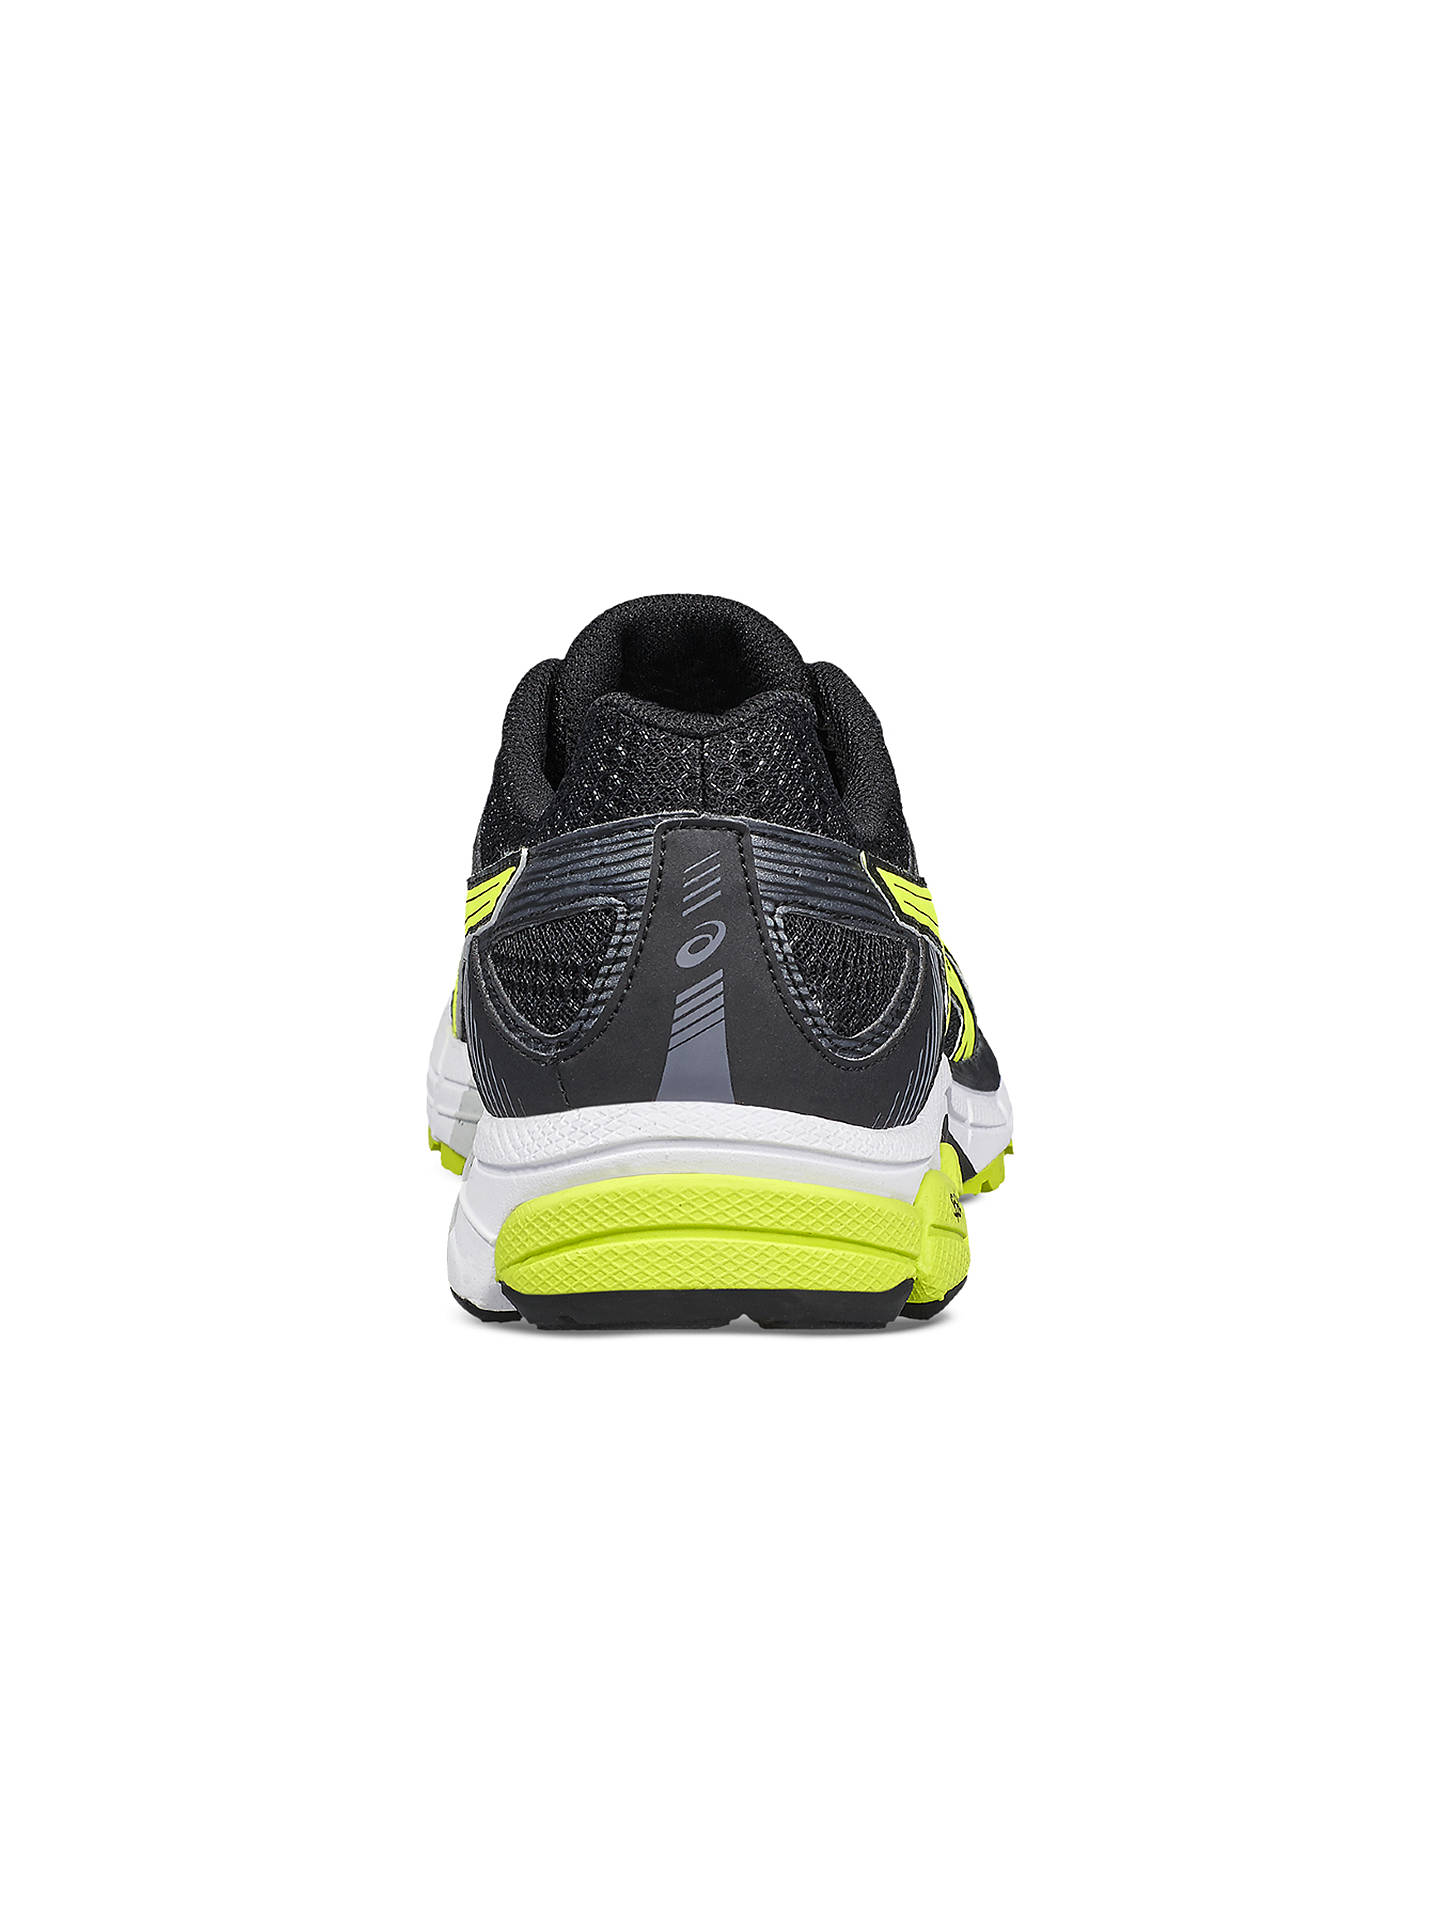 new styles 55651 9e22e Asics GEL-INNOVATE 7 Men's Running Shoes, Black/Yellow at ...